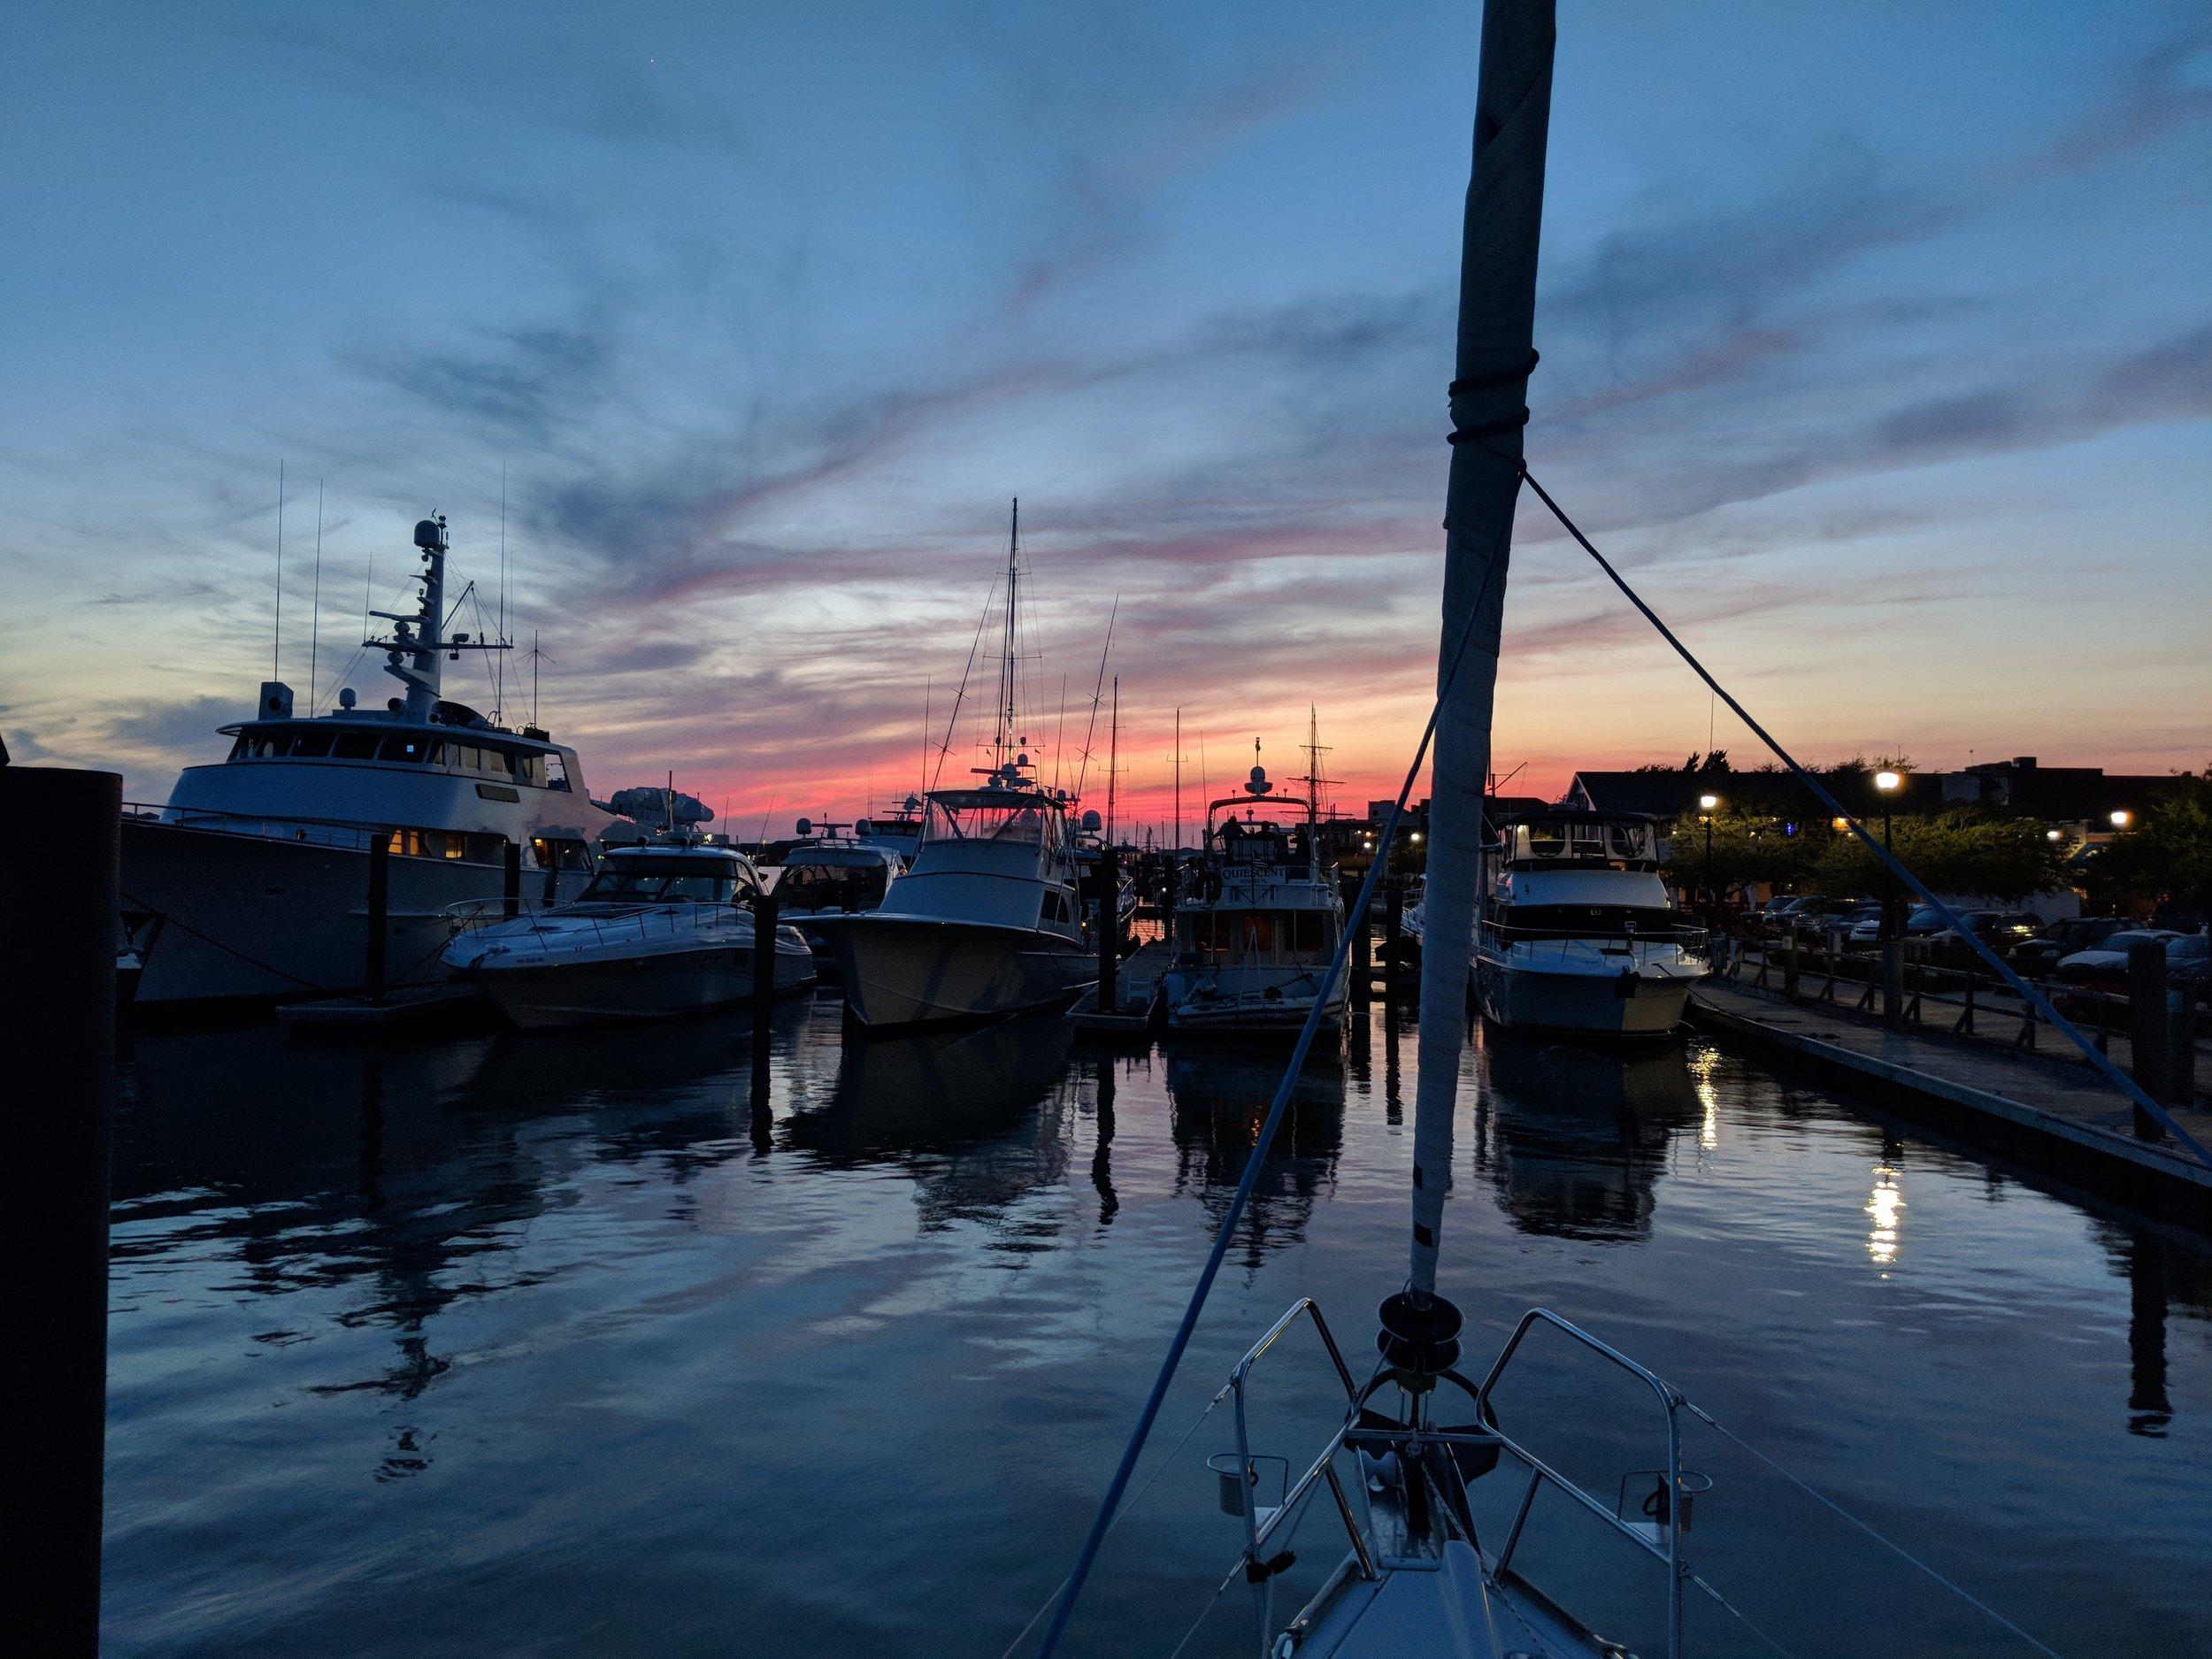 Sunset over the marina.